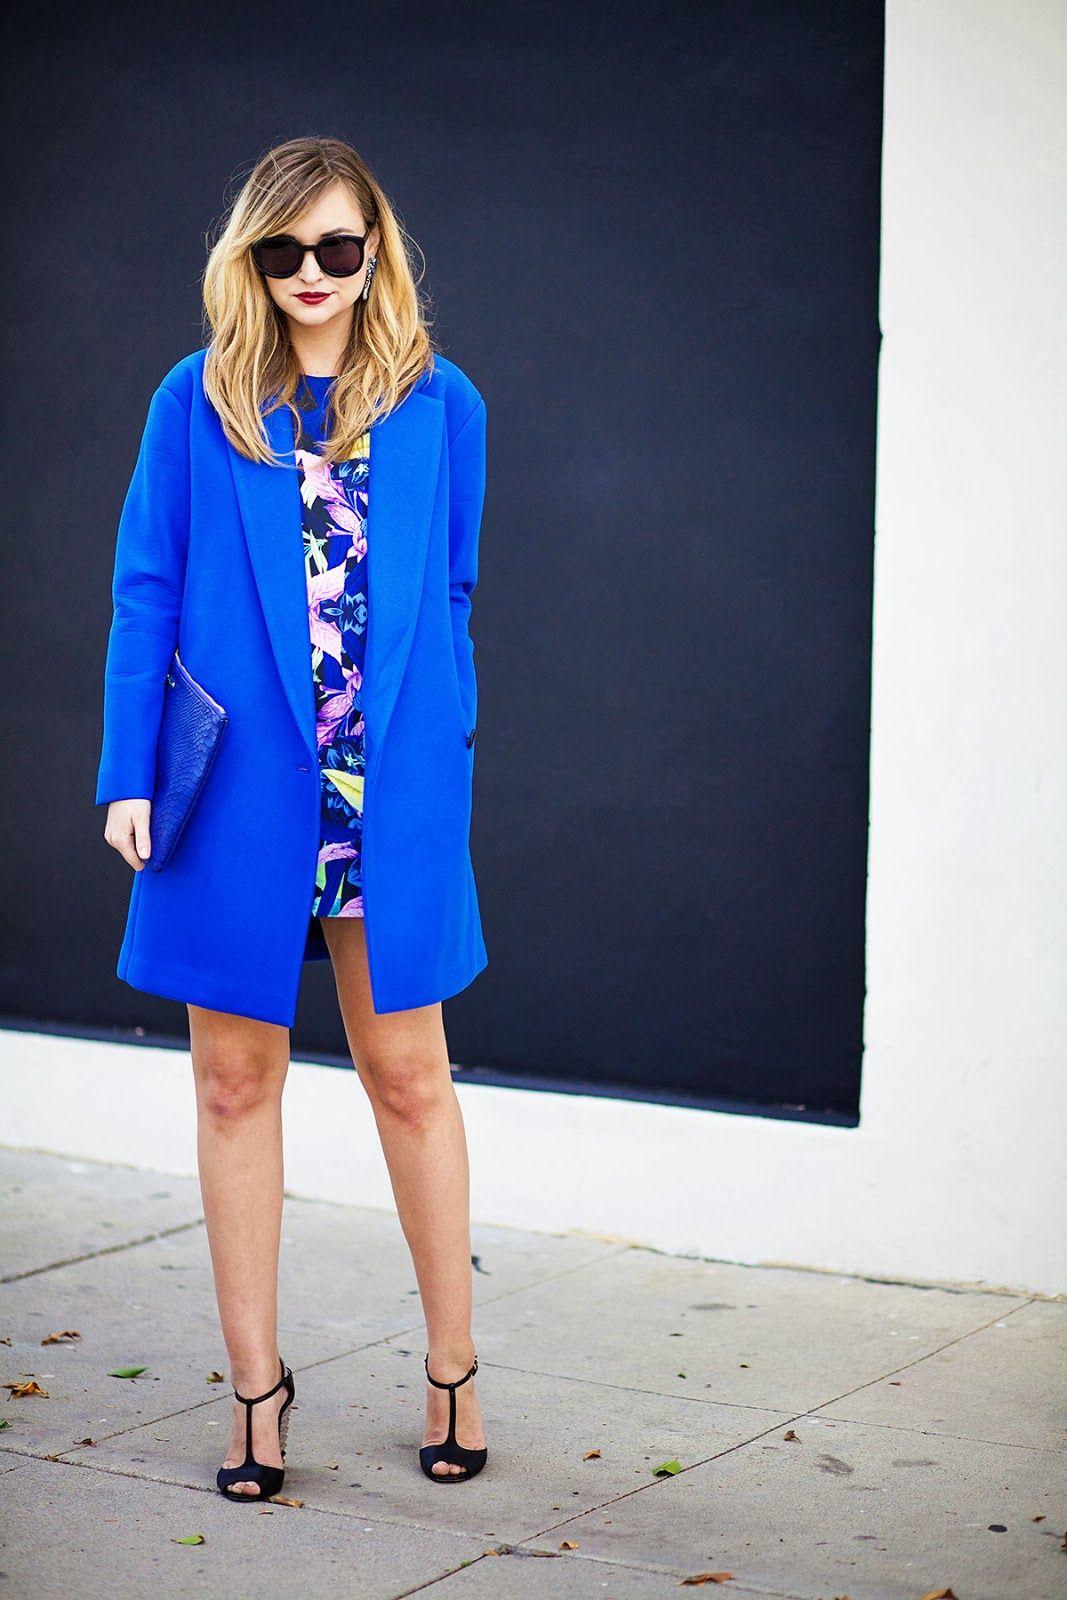 bluemarine | Fashion, Cold weather dresses, Bluemarine